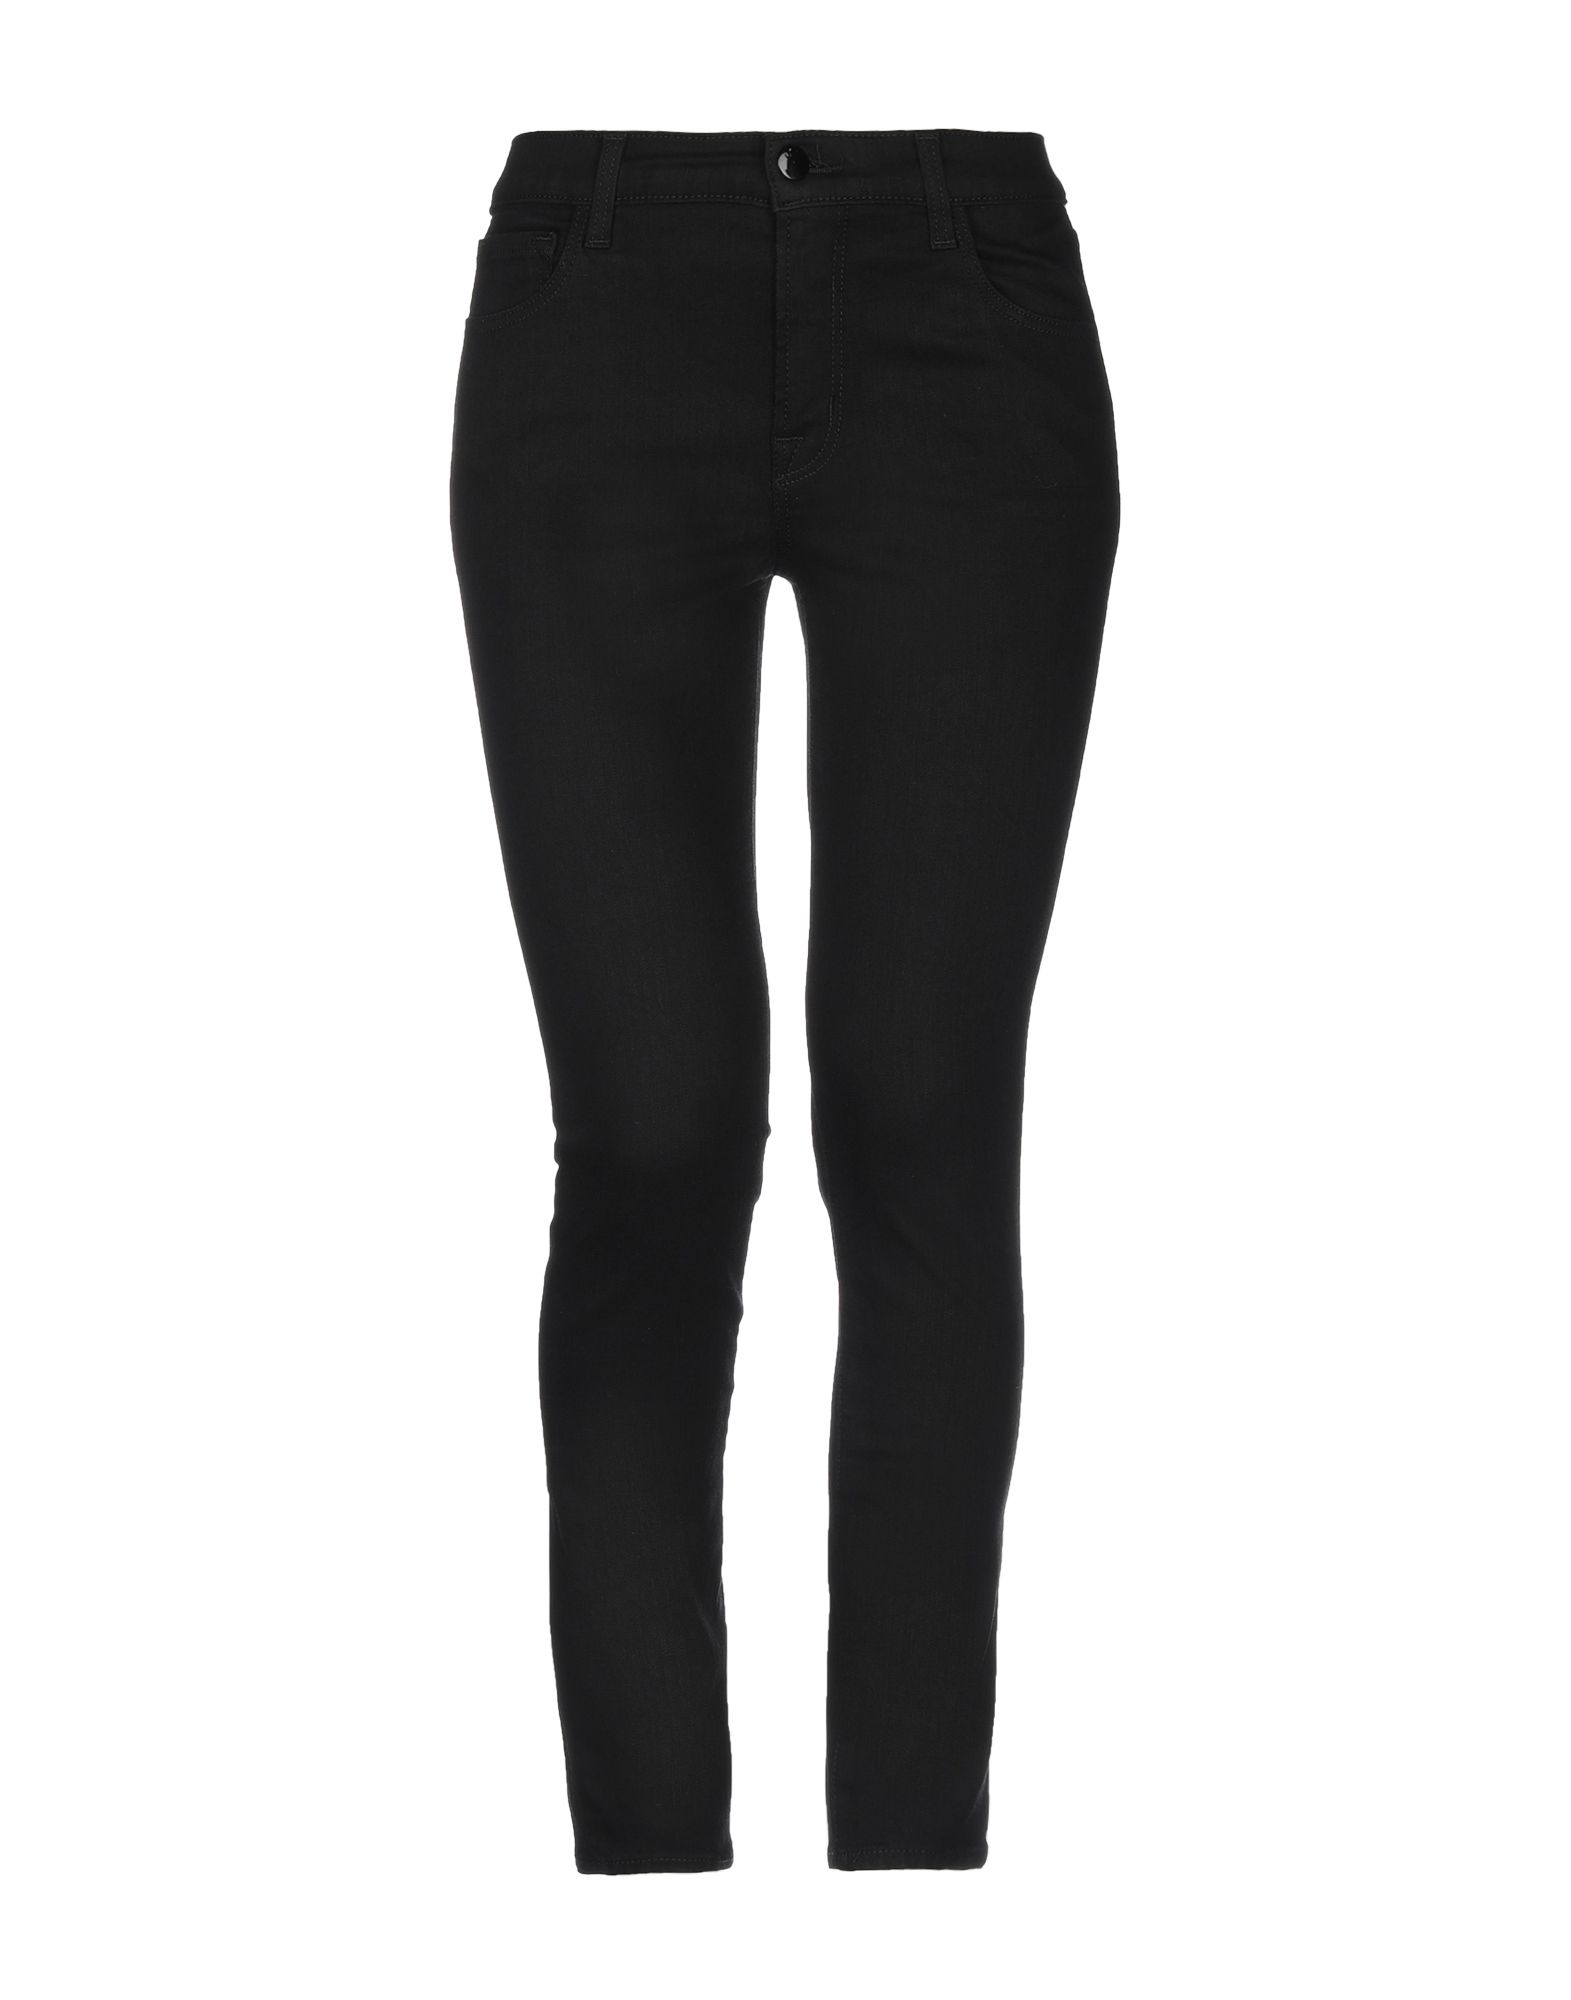 J BRAND Denim pants - Item 42704738